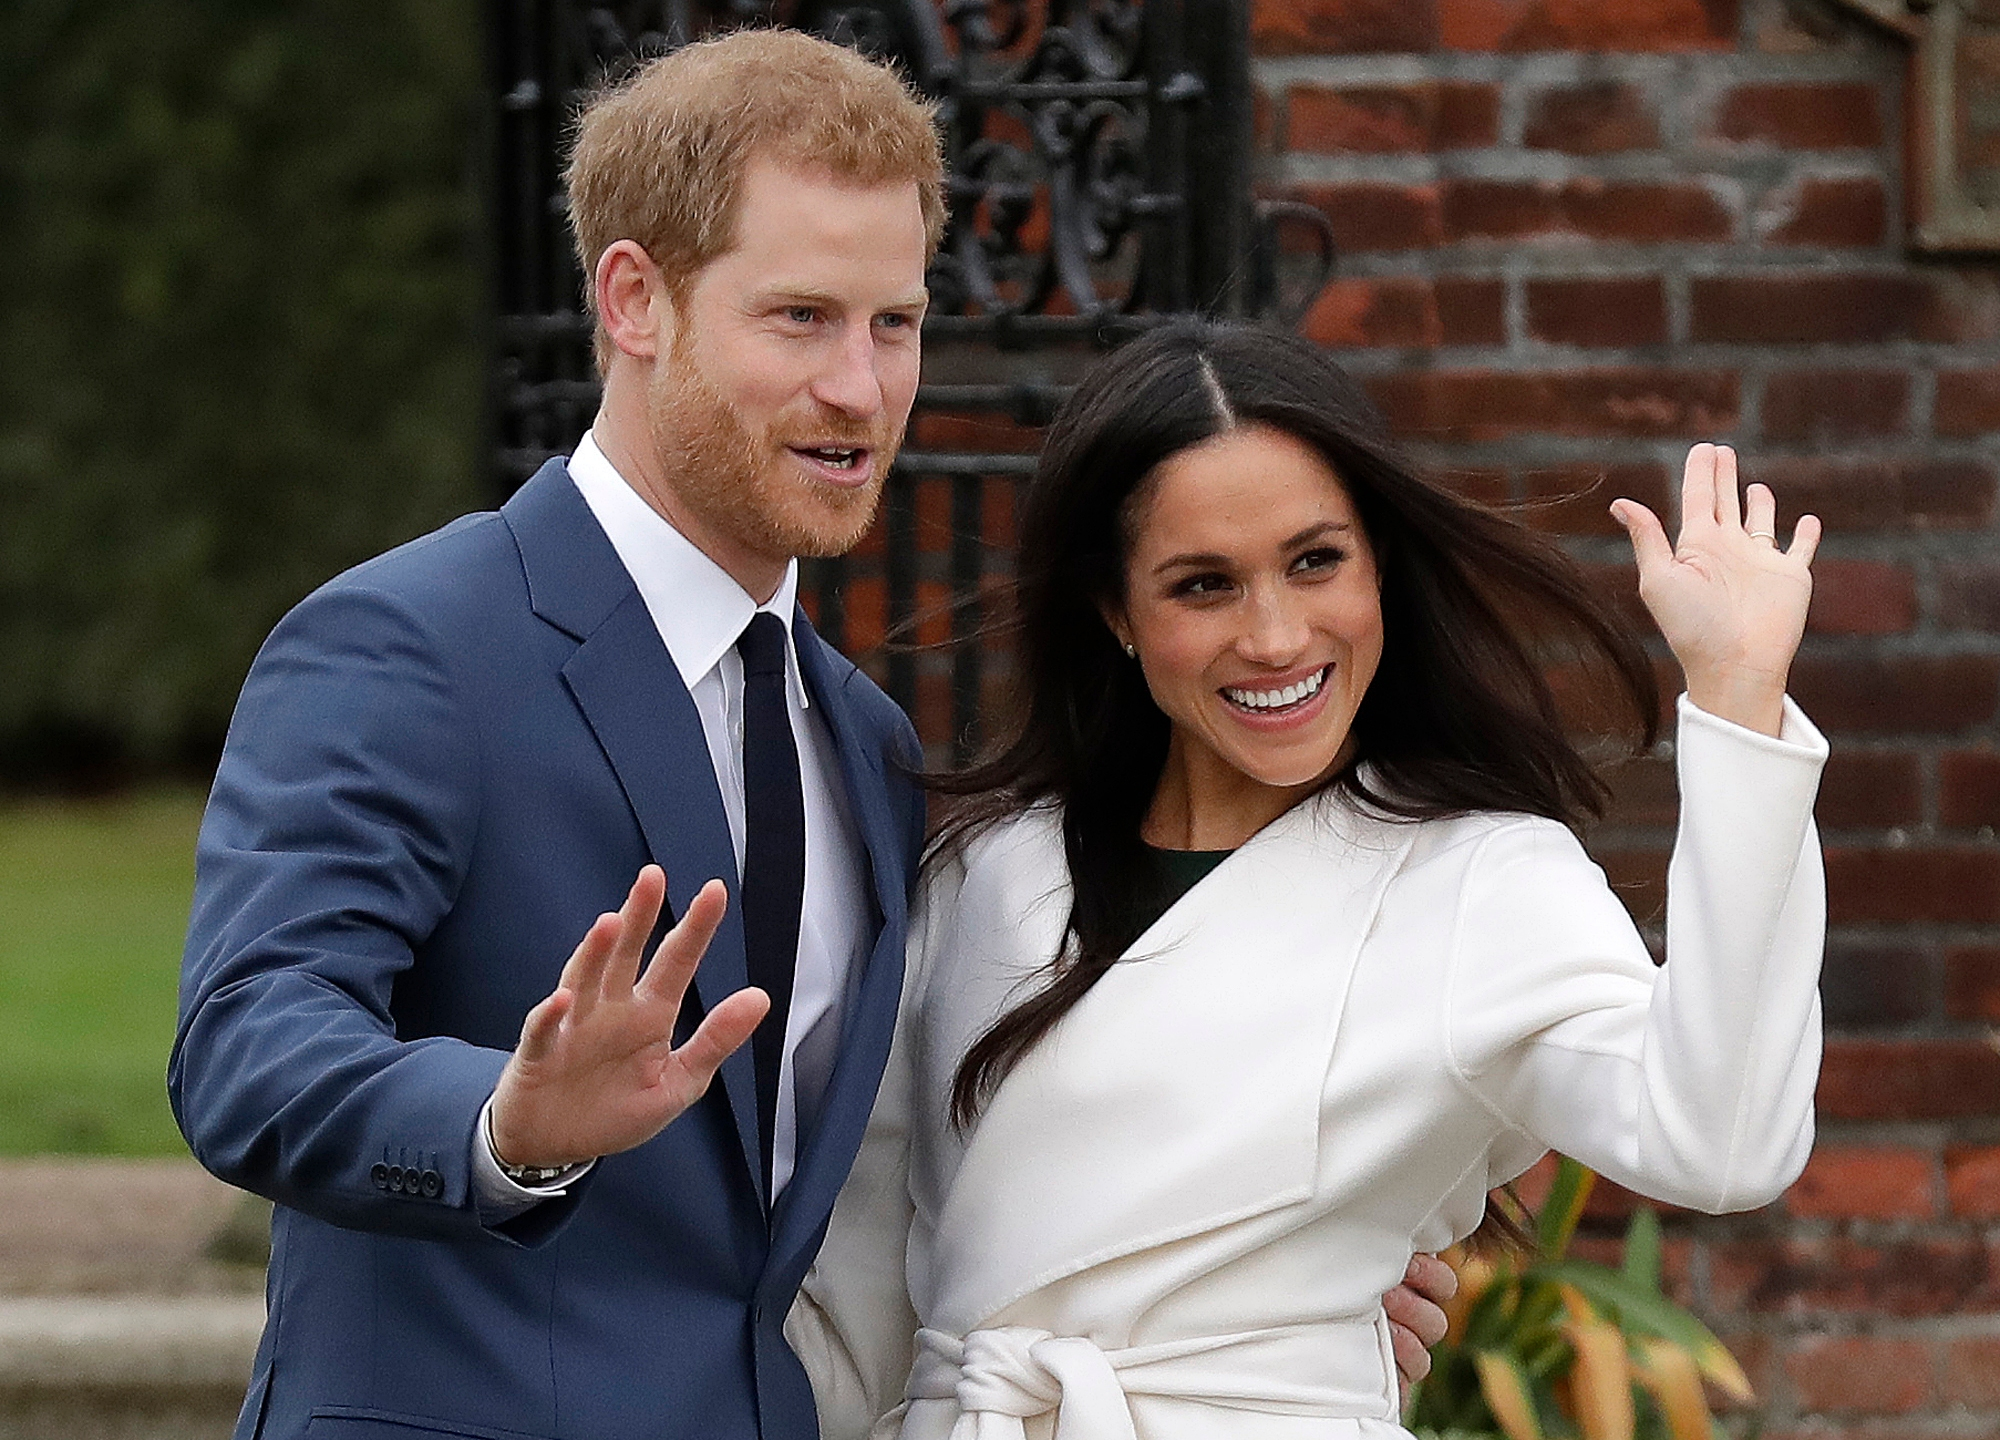 Britain_Royal_Baby_Prince_Harry_04208-159532.jpg62869982